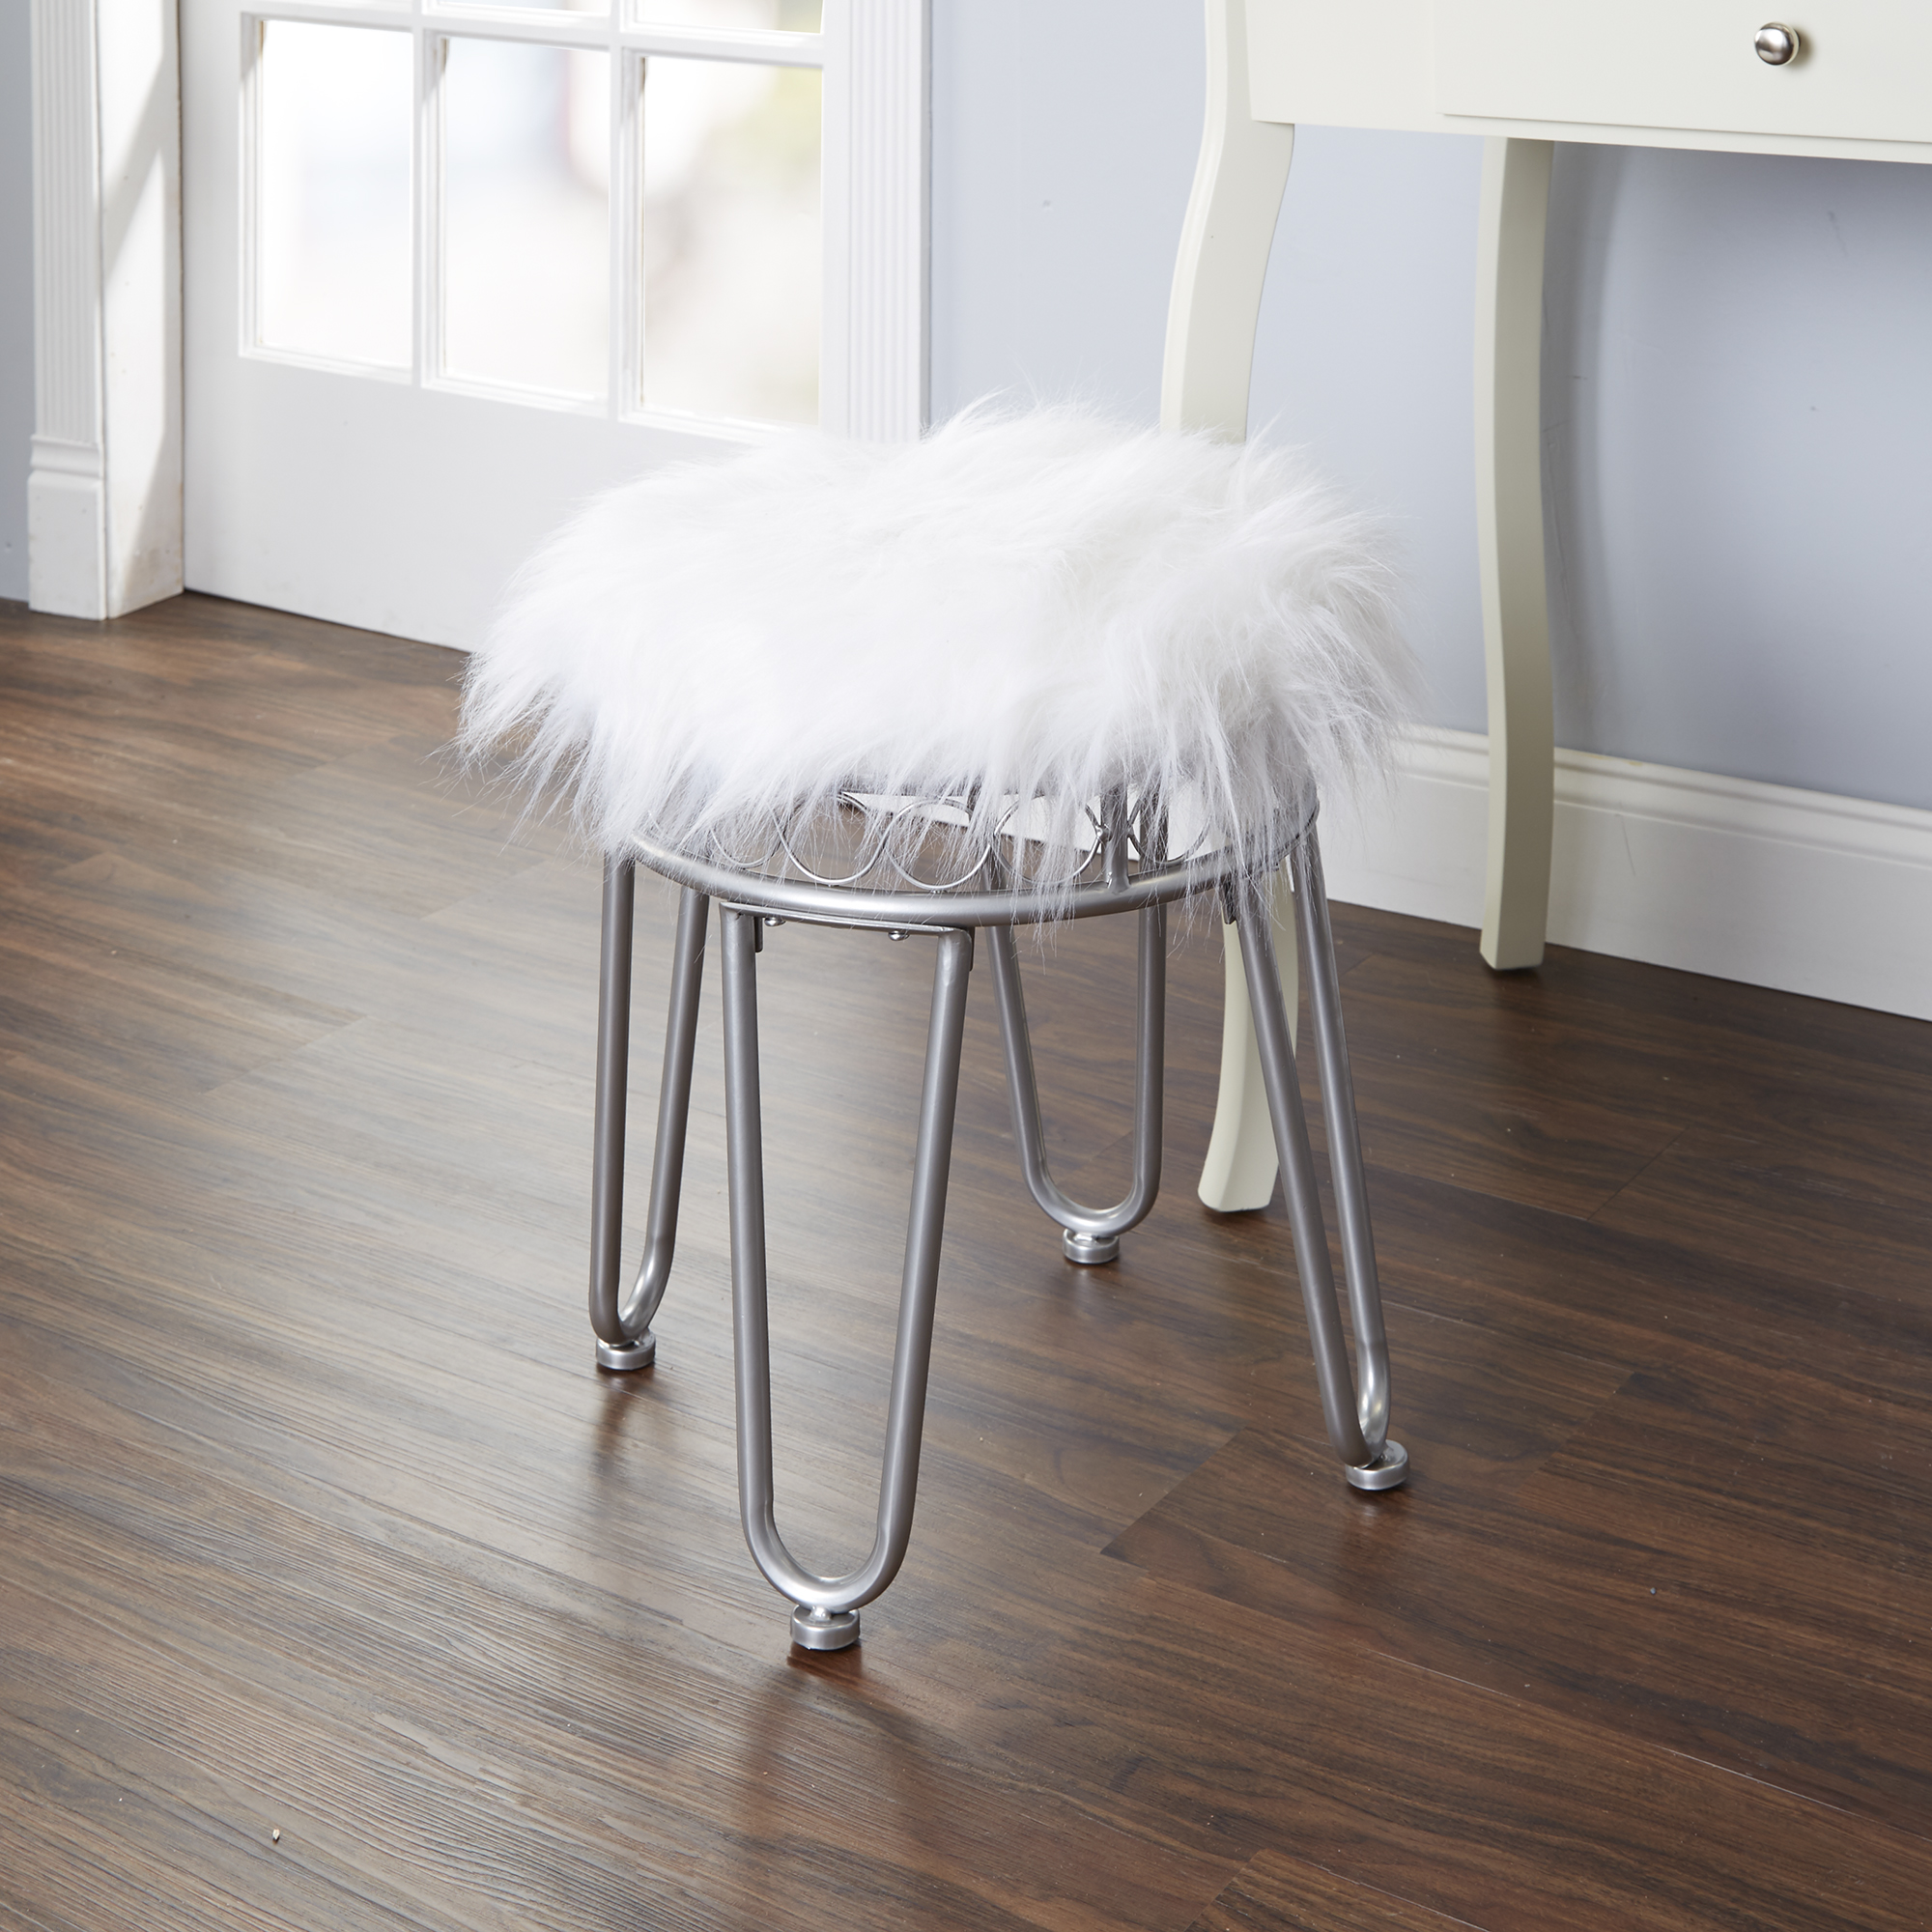 Silverwood Hannah Faux Fur Vanity Stool With Hairpin Legs